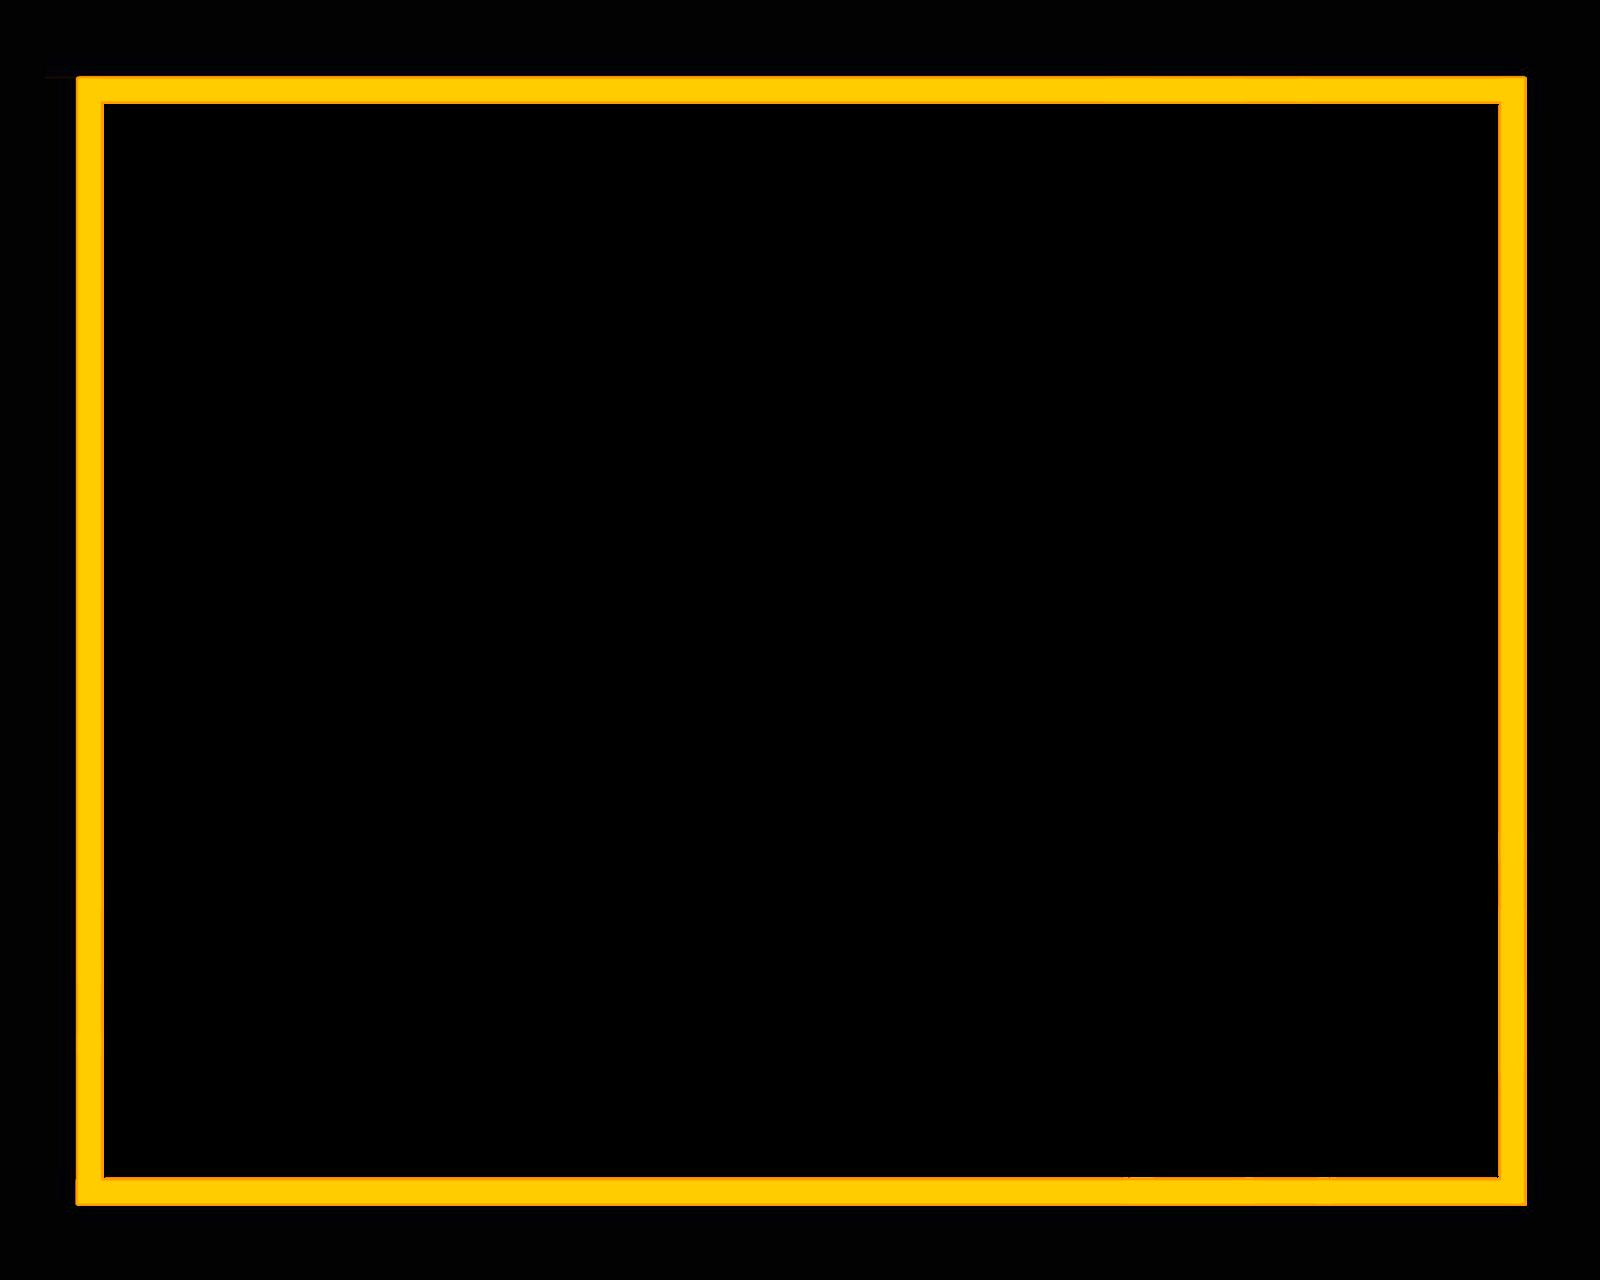 Squares clipart black border Darker Clip Frame Art border